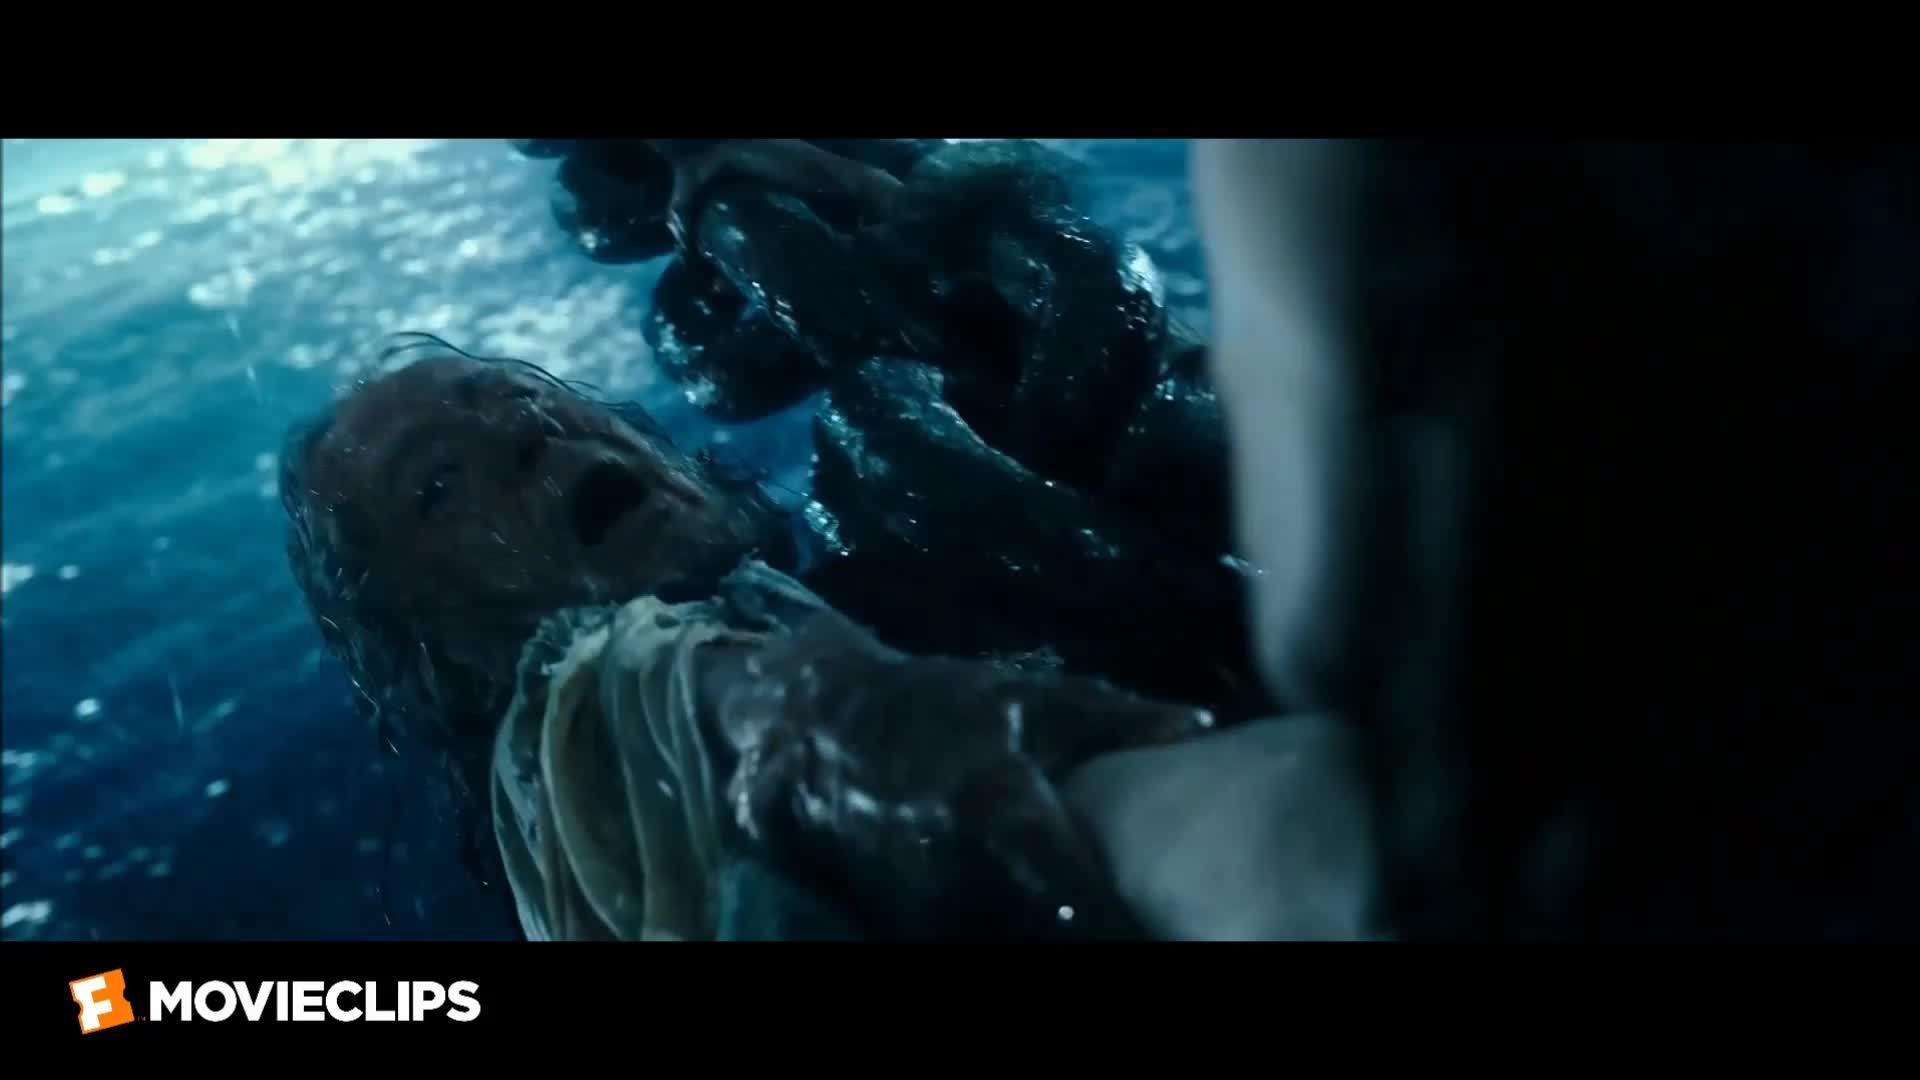 Barbossa chết (Pirates of the Caribbean: Salazar's Revenge)